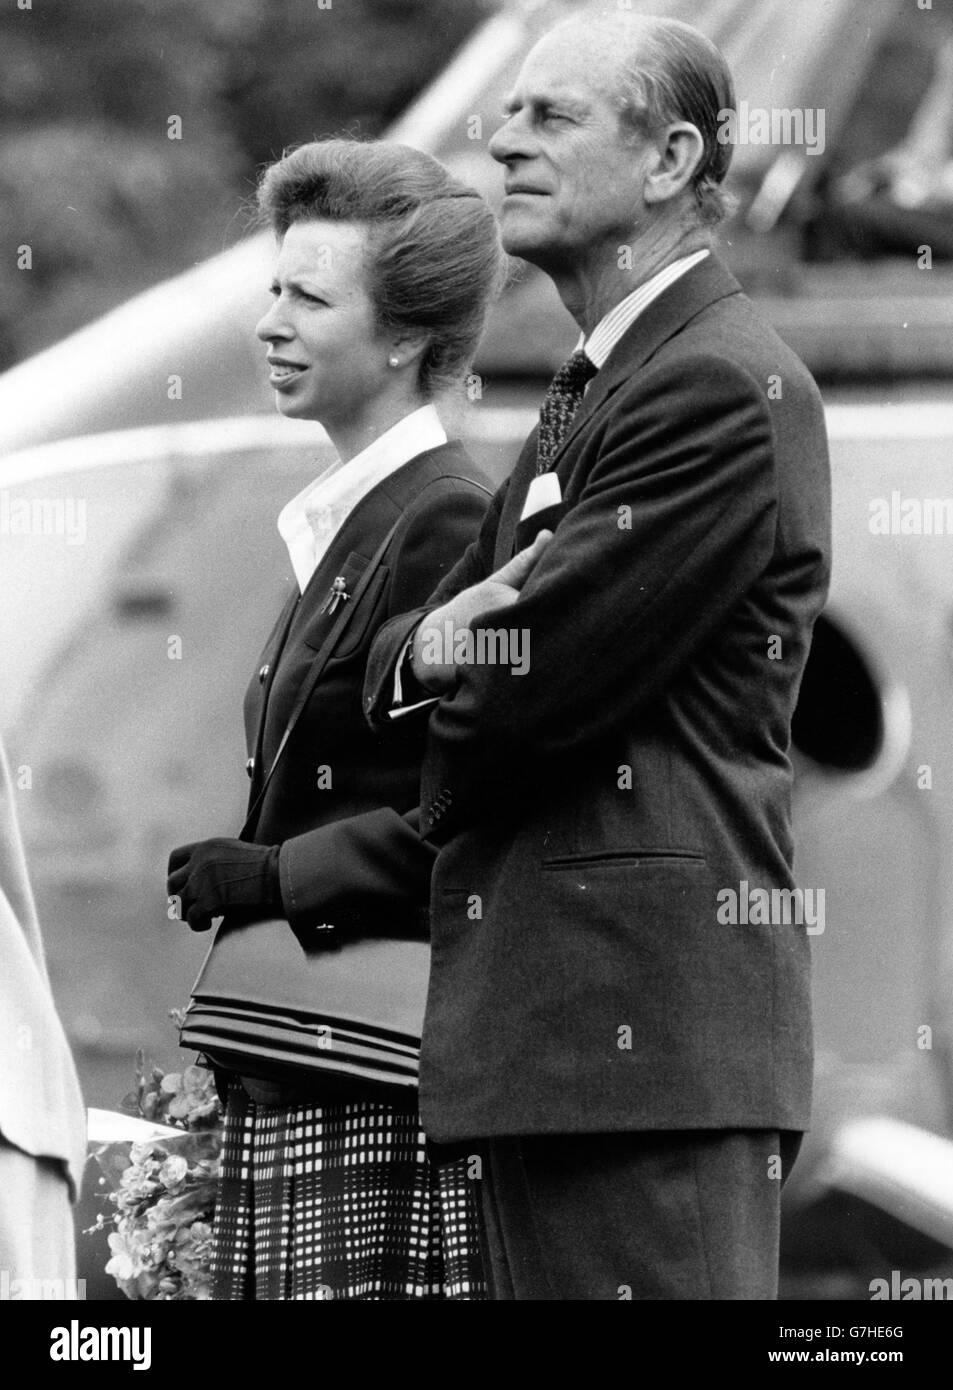 Royalty -- Duke of Edinburgh and Princess Anne - Cambridge - Stock Image